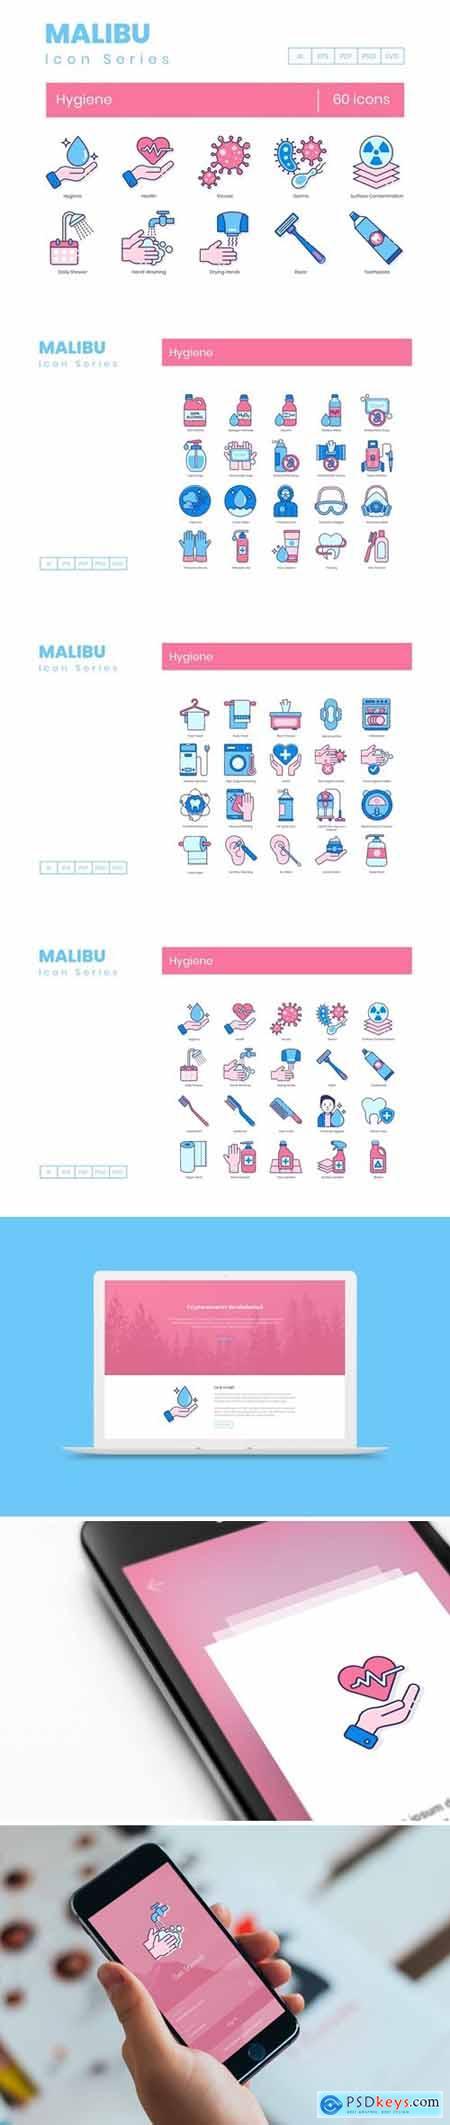 60 Hygiene Icons - Malibu Series